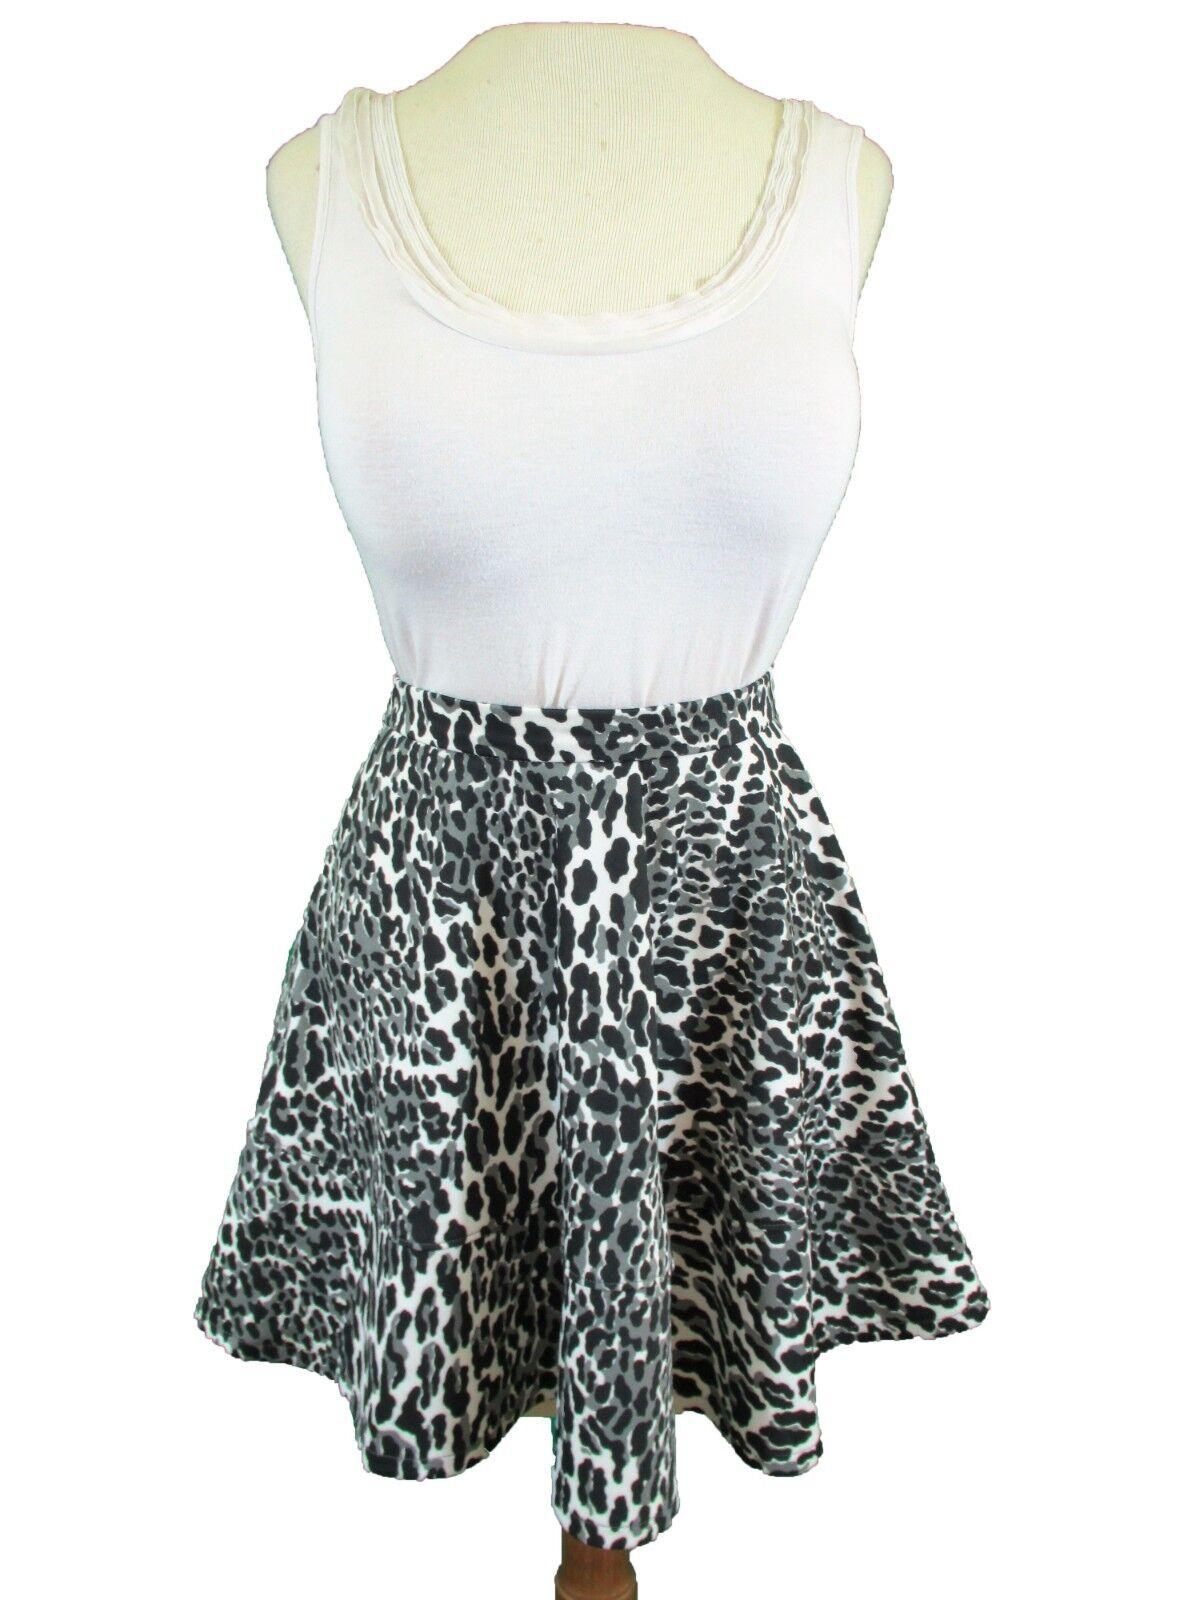 Amanda Uprichard Clarence Circle Skirt (S)  148 Cheetah Print NEW